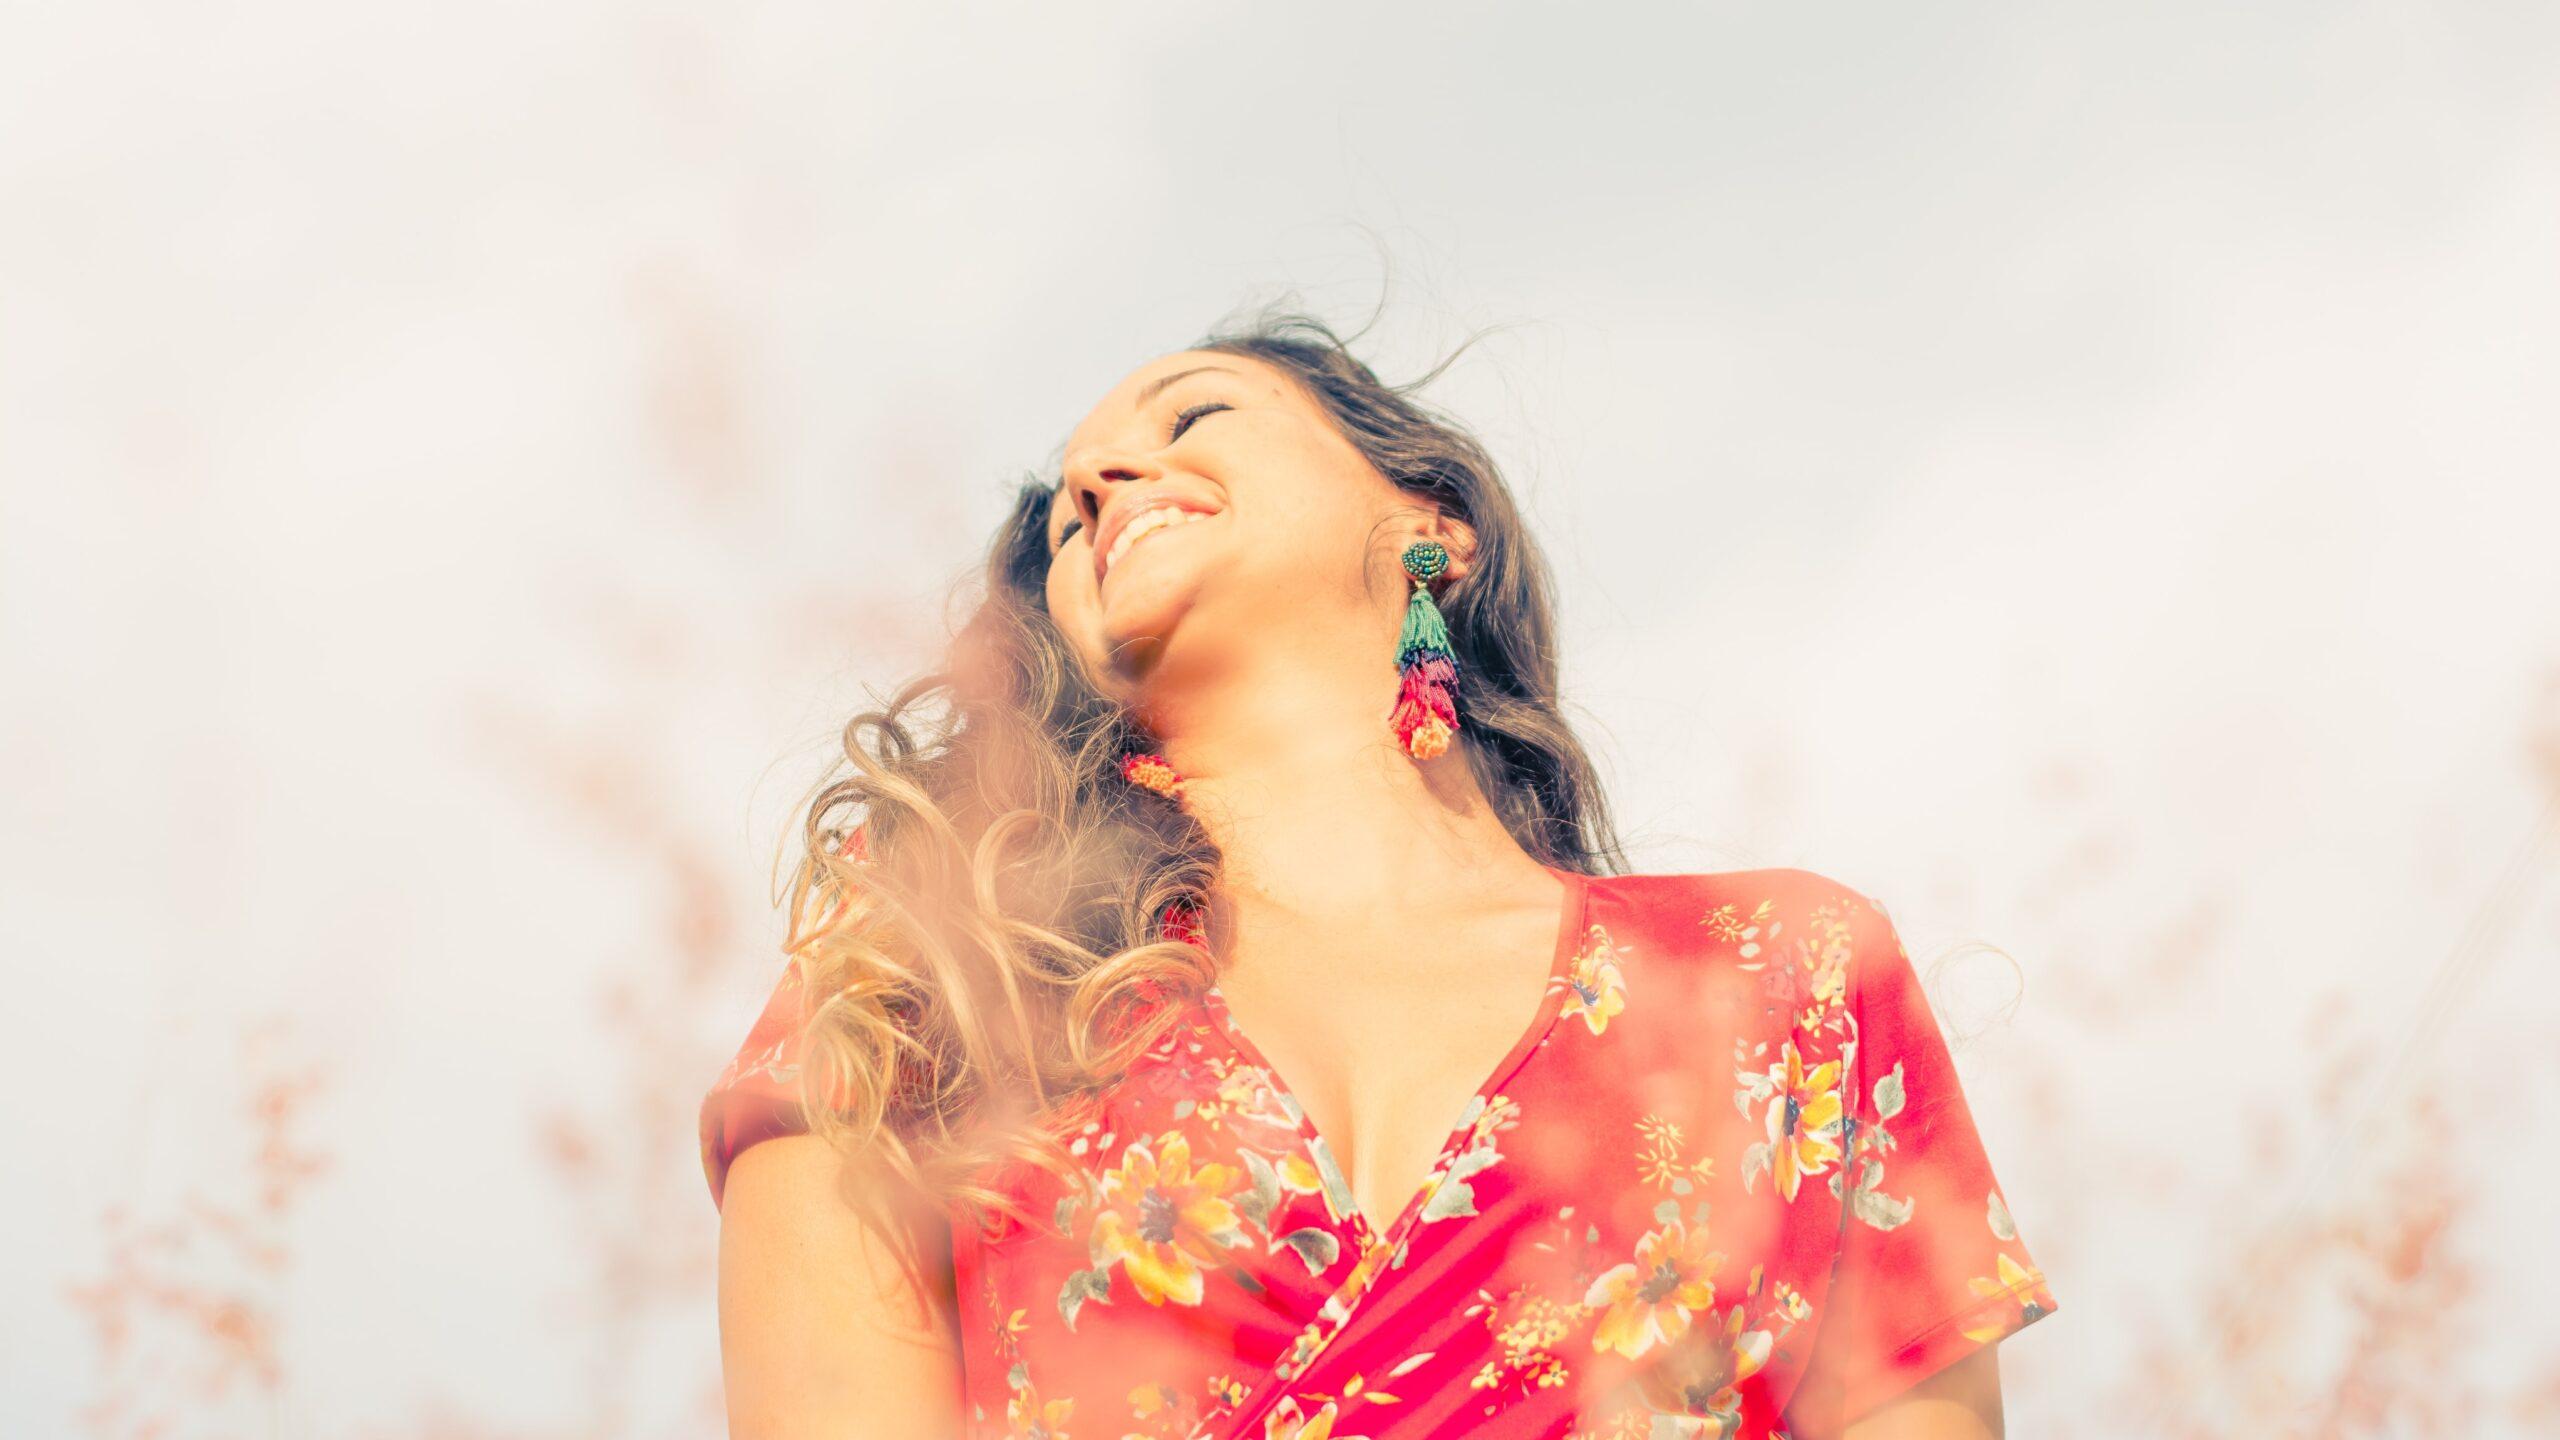 Woman laughing Photo by Ricardo Arce